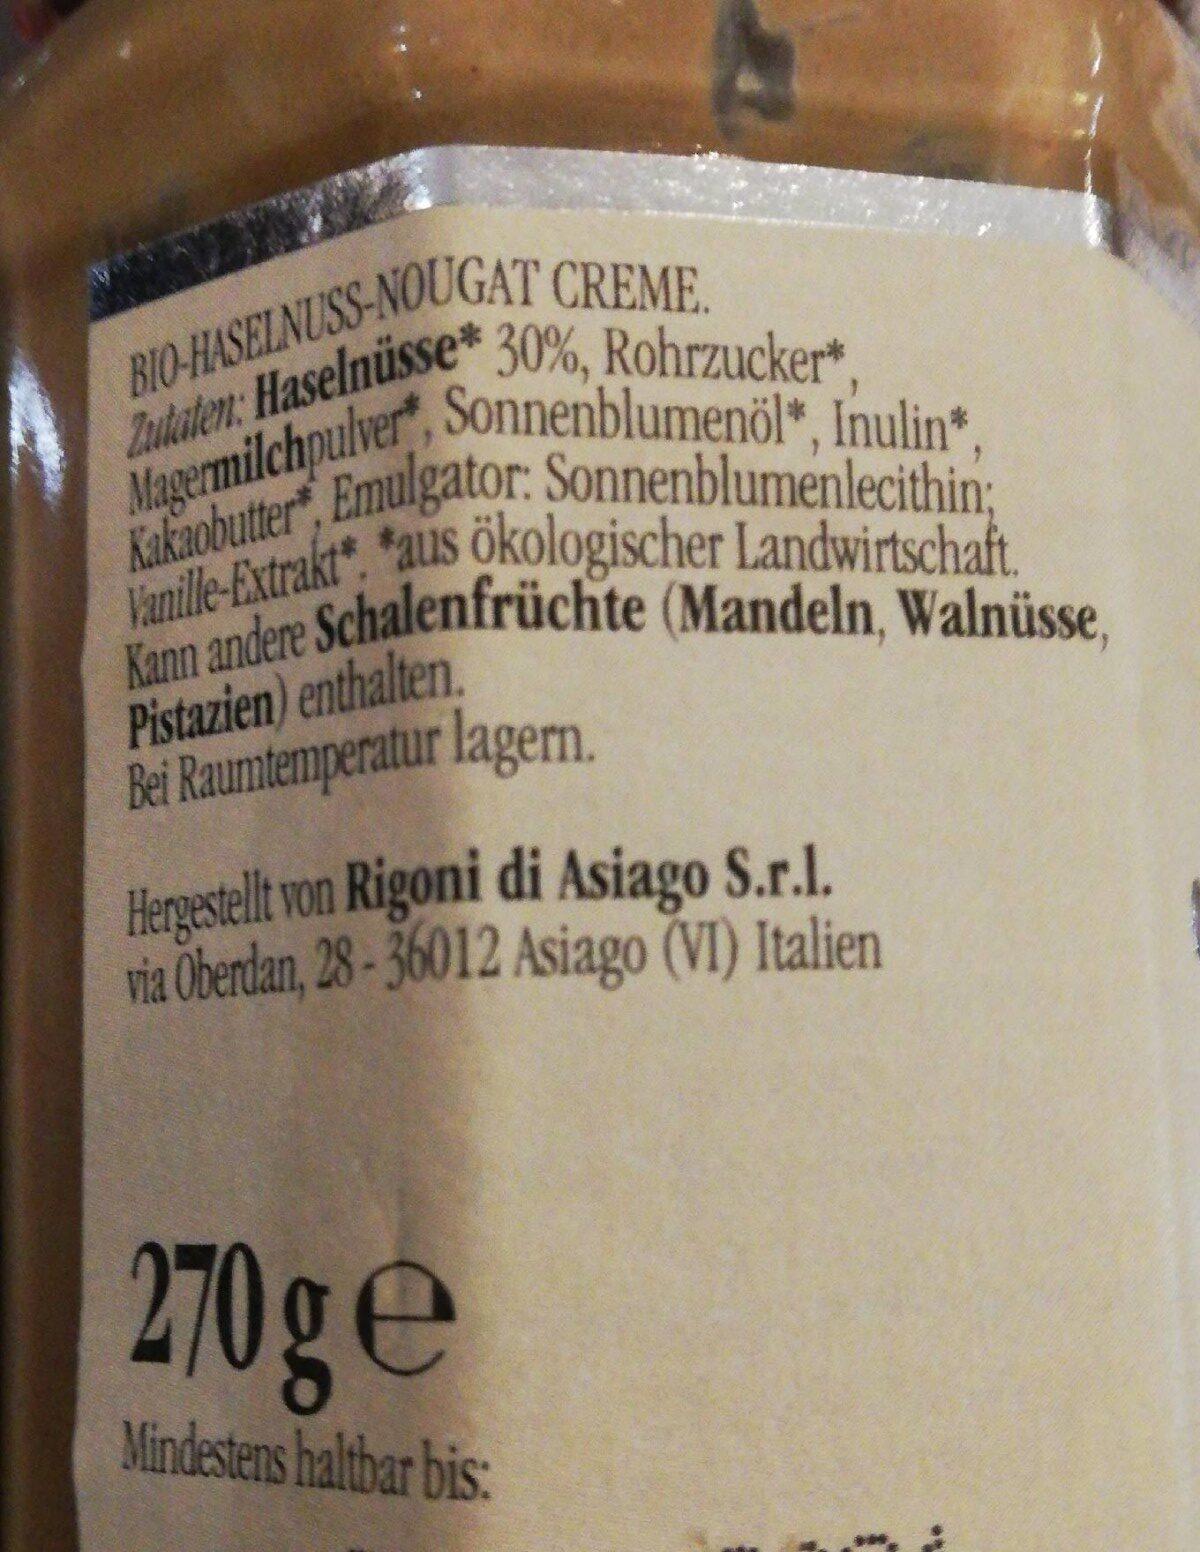 Nocciolata Bianca bio nougat crème - Ingrediënten